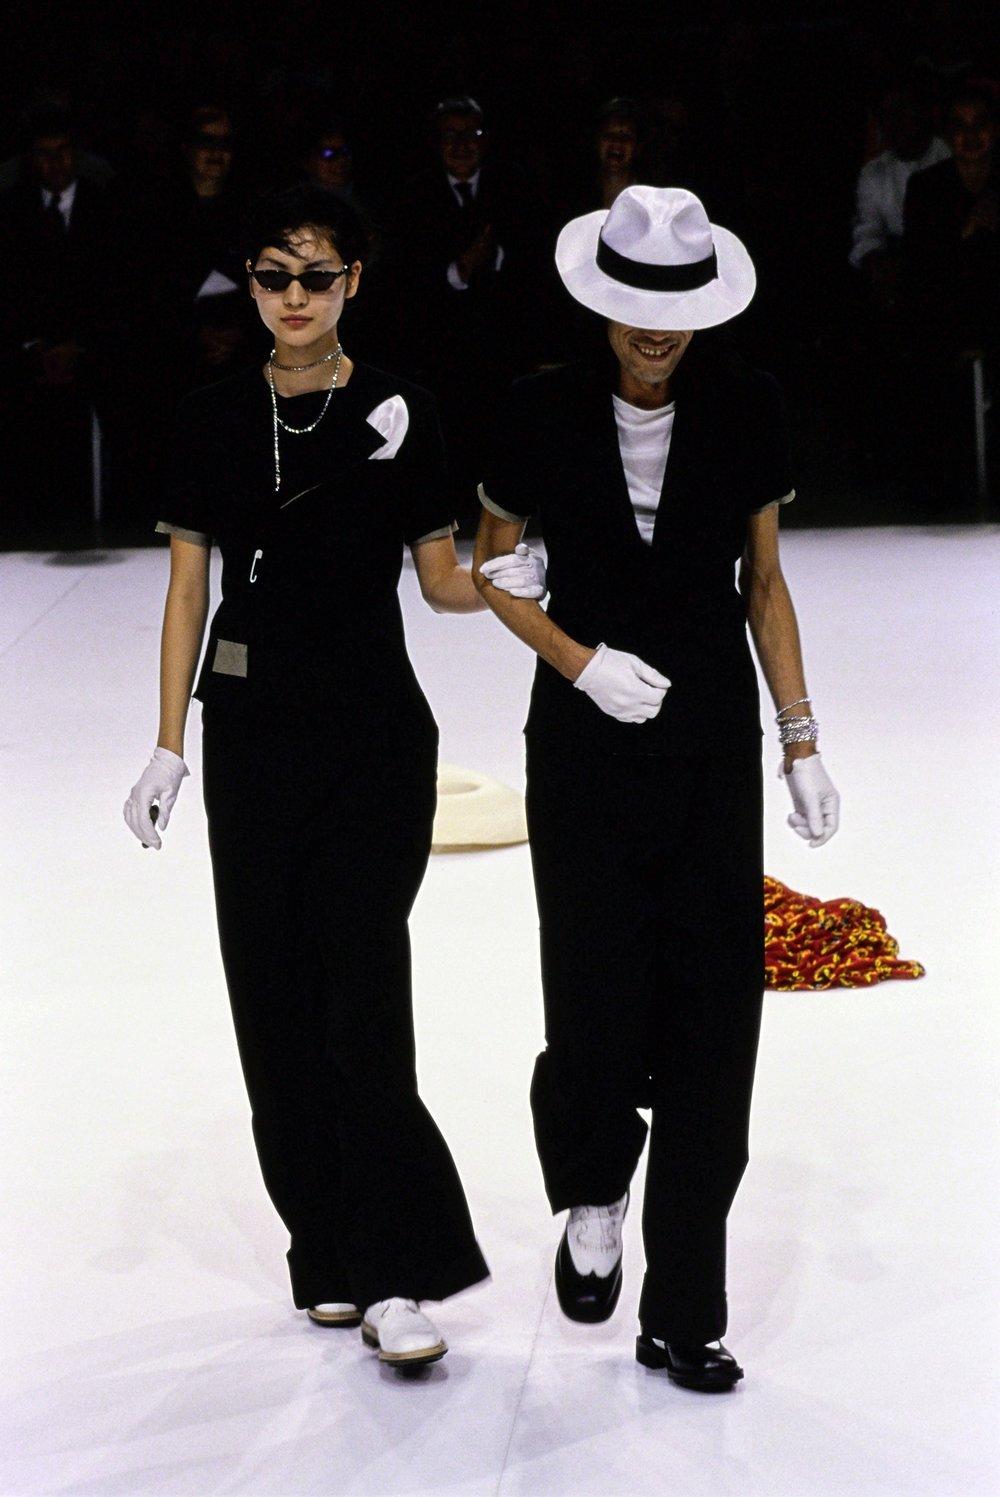 YOHJI-YAMAMOTO-SPRING-1999-RTW-16.jpg